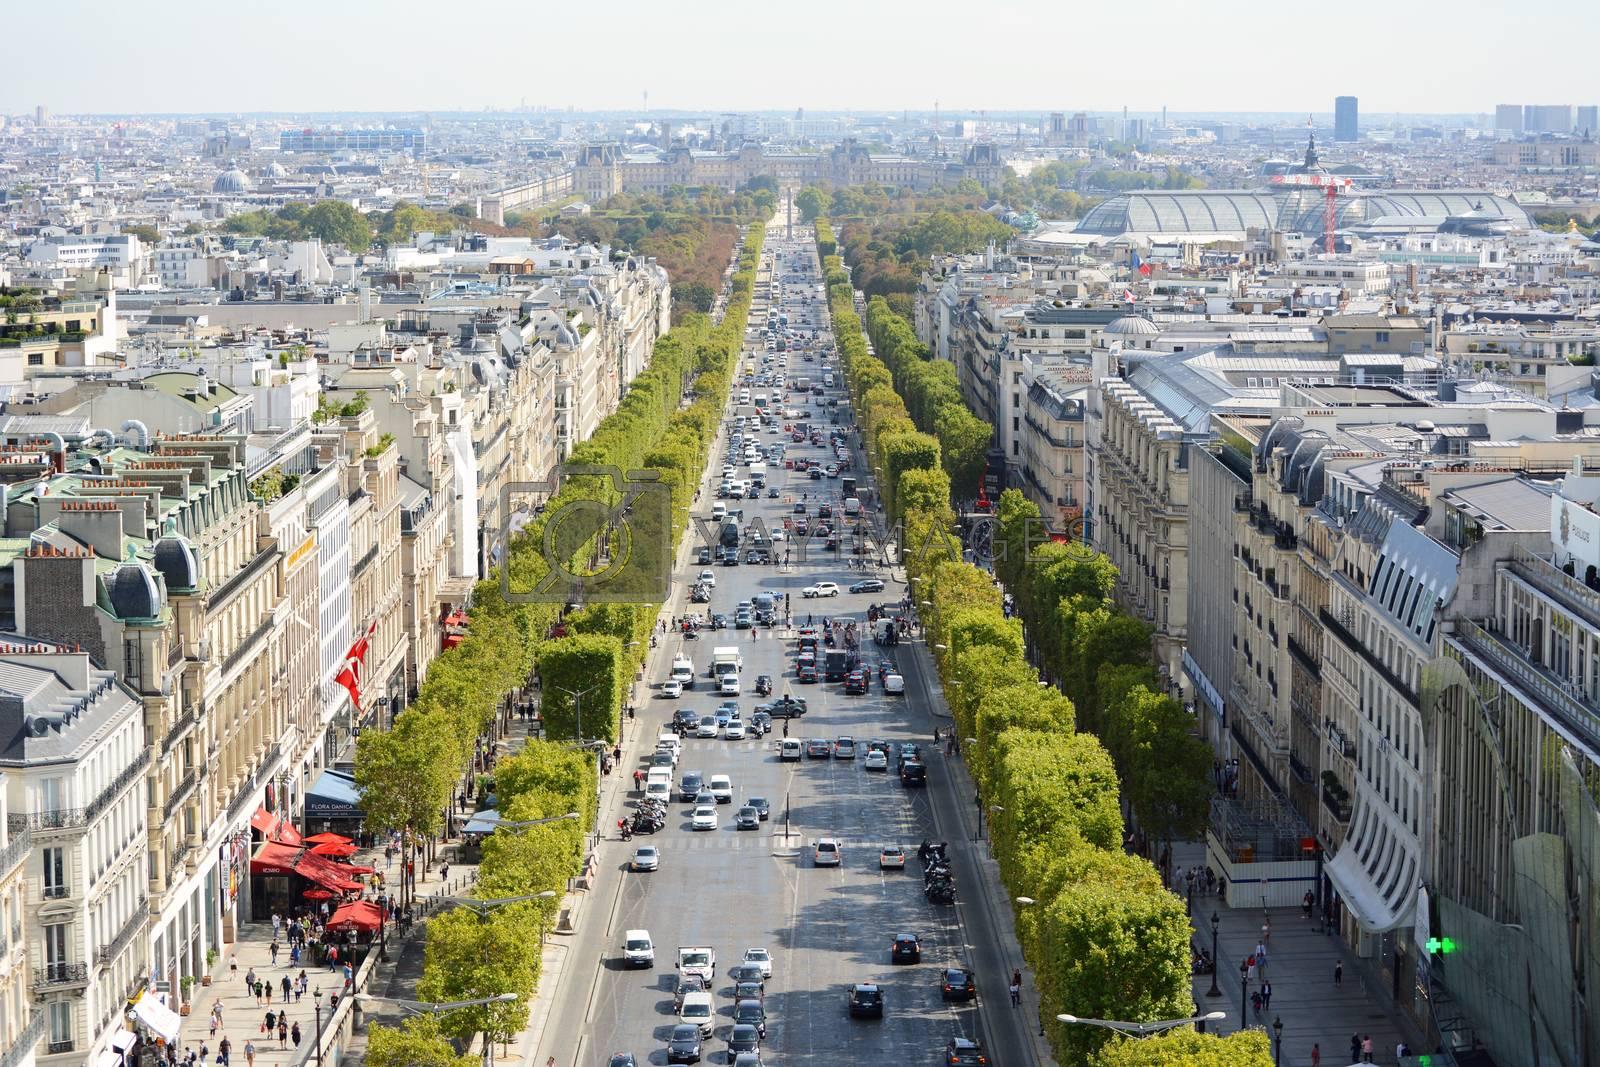 View from the Arc de Triomphe in Paris, down the Avenue des Champs-Elysees, towards the Louvre